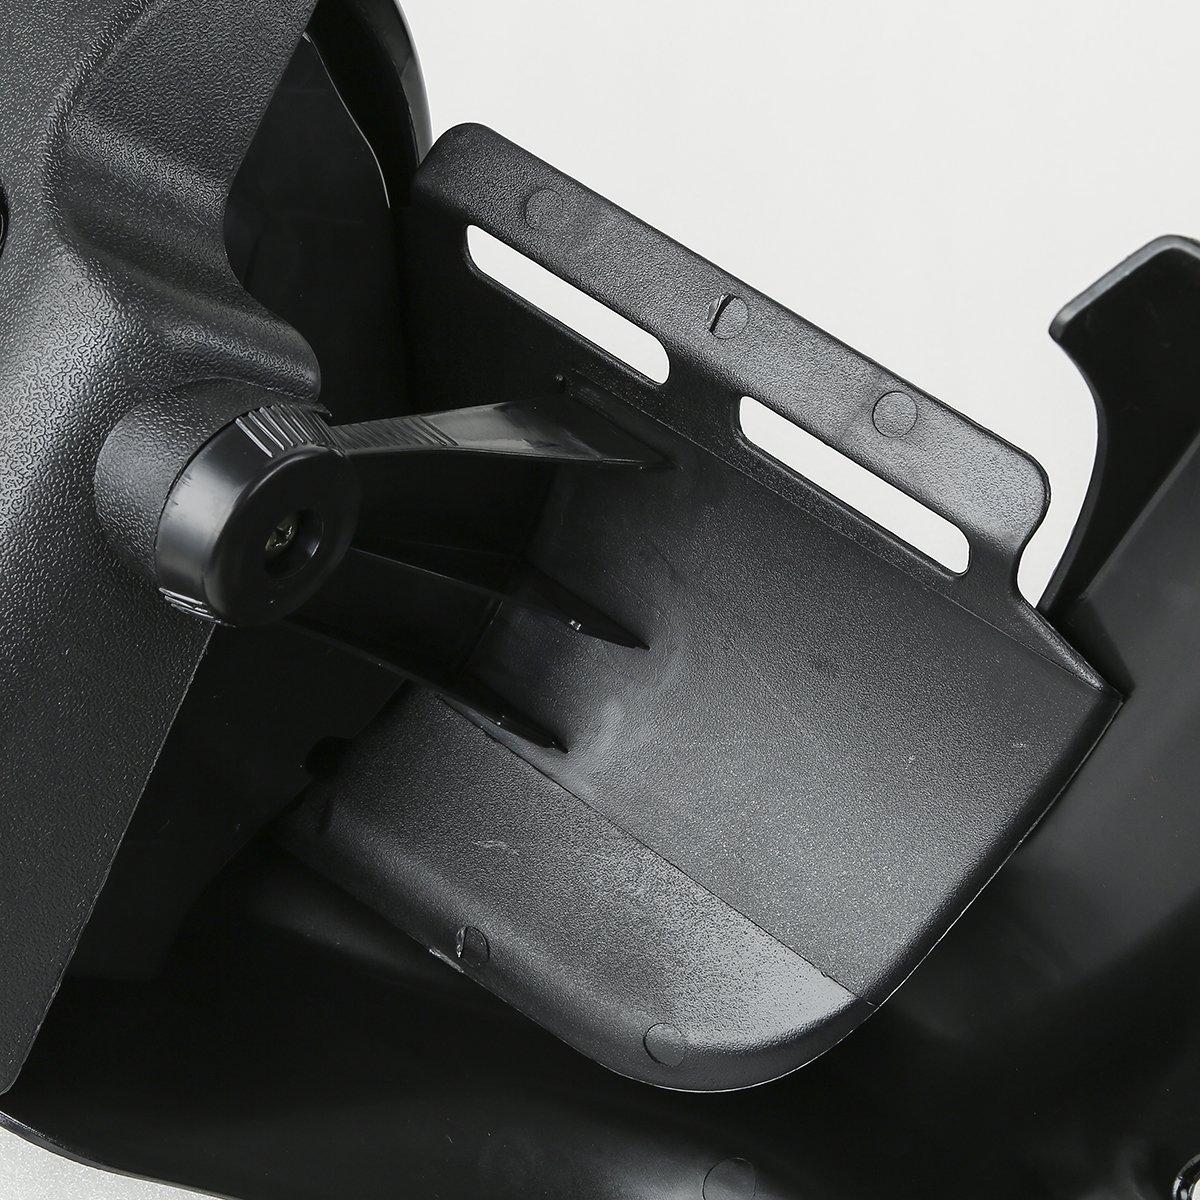 XMT-MOTO Black Lower Vented Leg Fairings Cap Glove Box For Harley-Davidson Touring Models 1983-2013 by XMT-MOTO (Image #6)